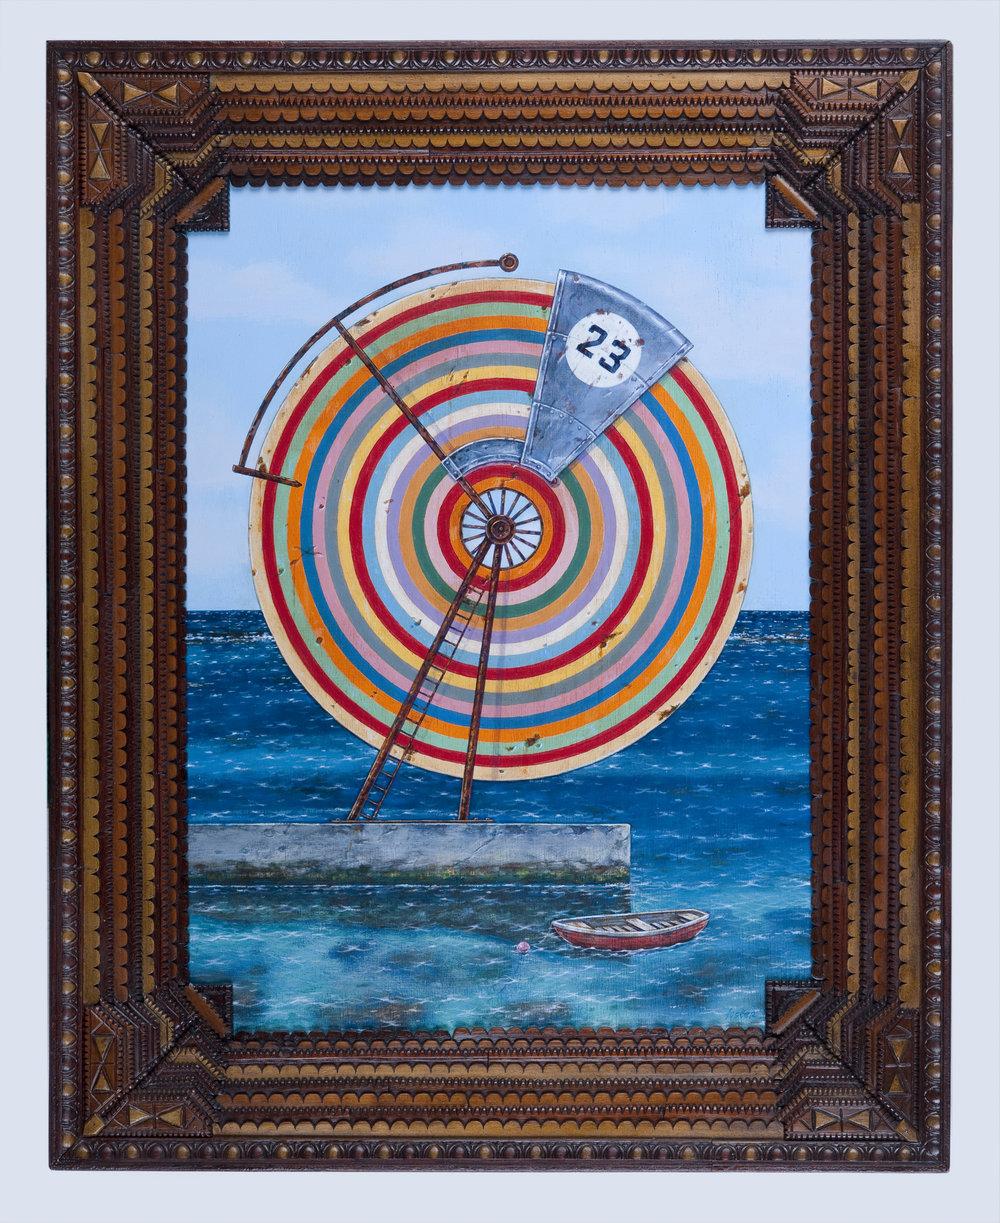 Rainbow Wheel at Deep Dene No. 23